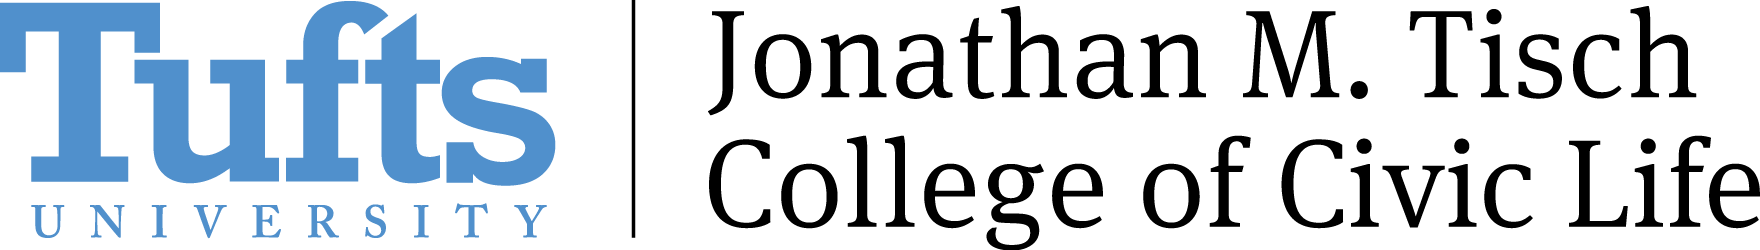 tisch-horizontal-lockup